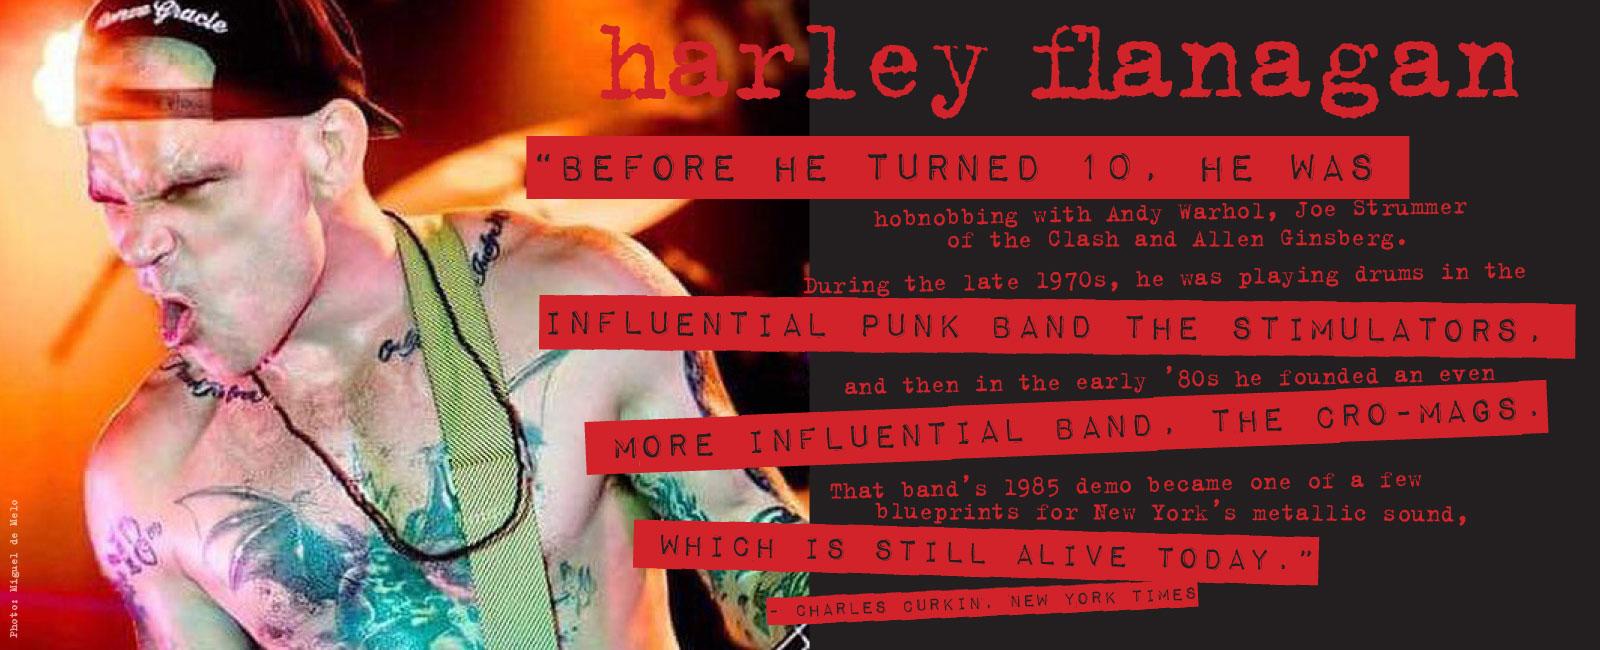 Harley Flanagan About